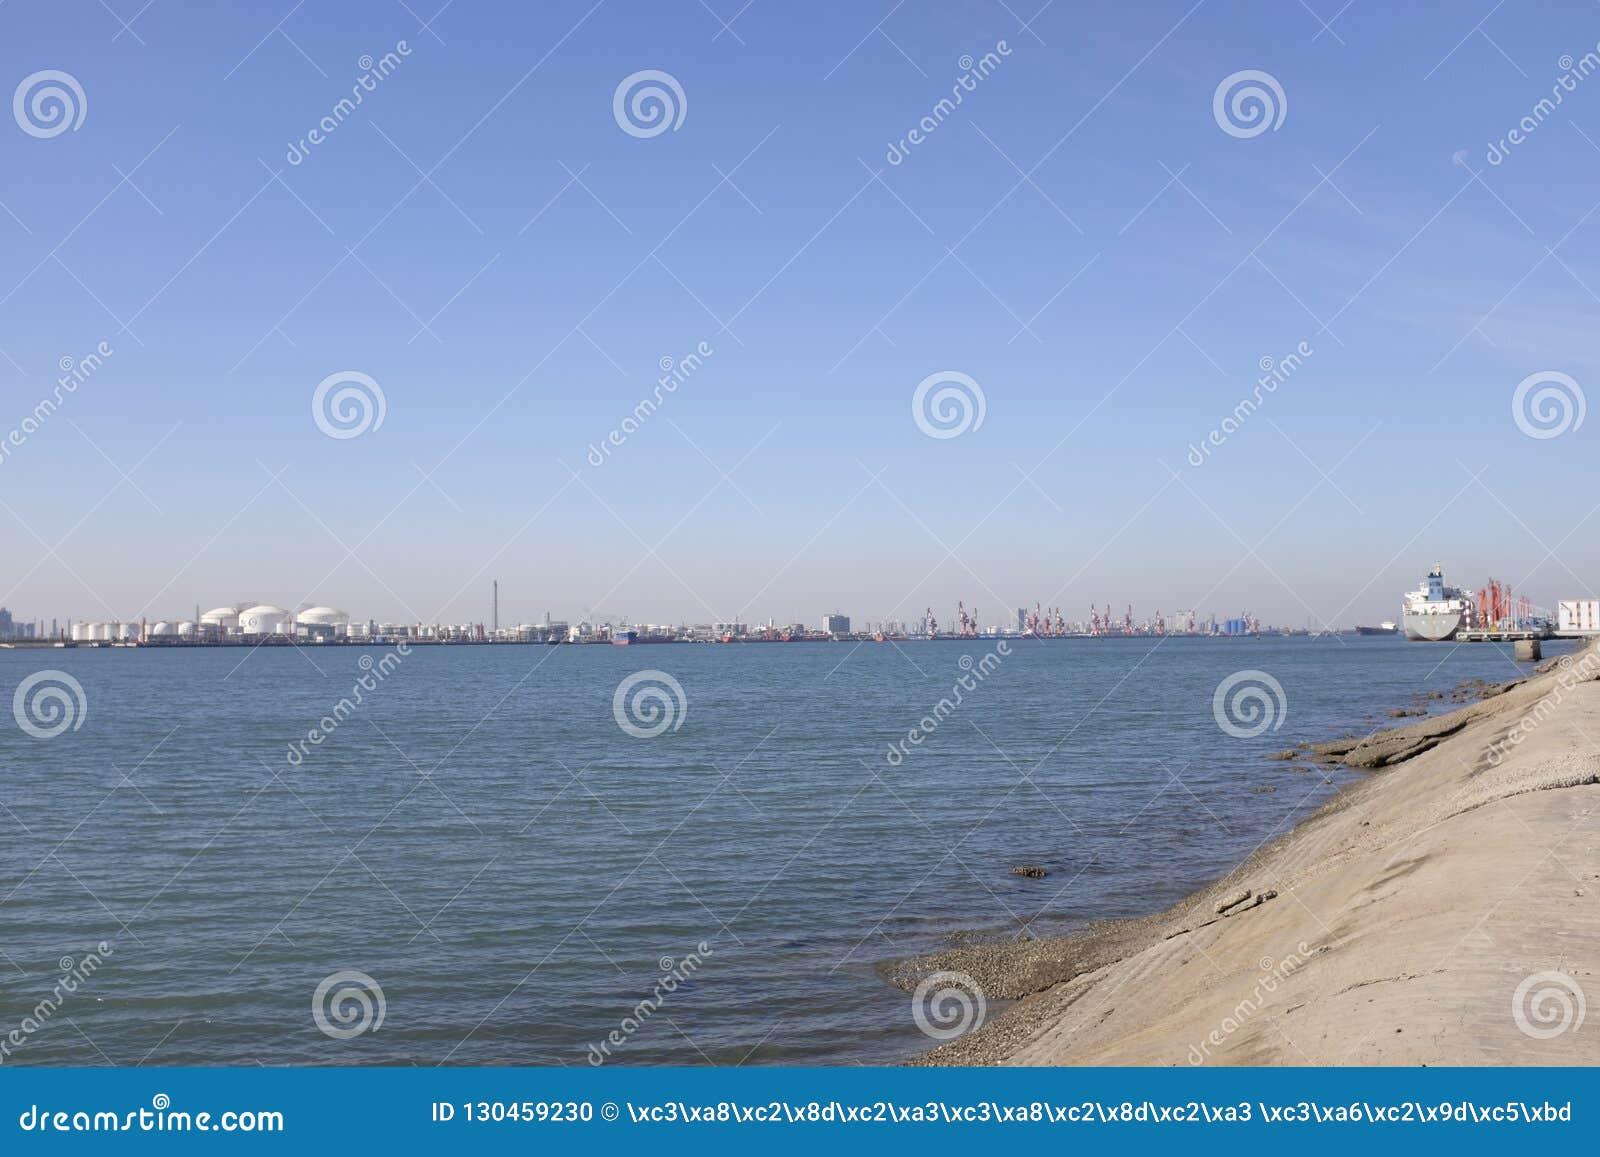 Tianjin Port,also known as Xingang, China